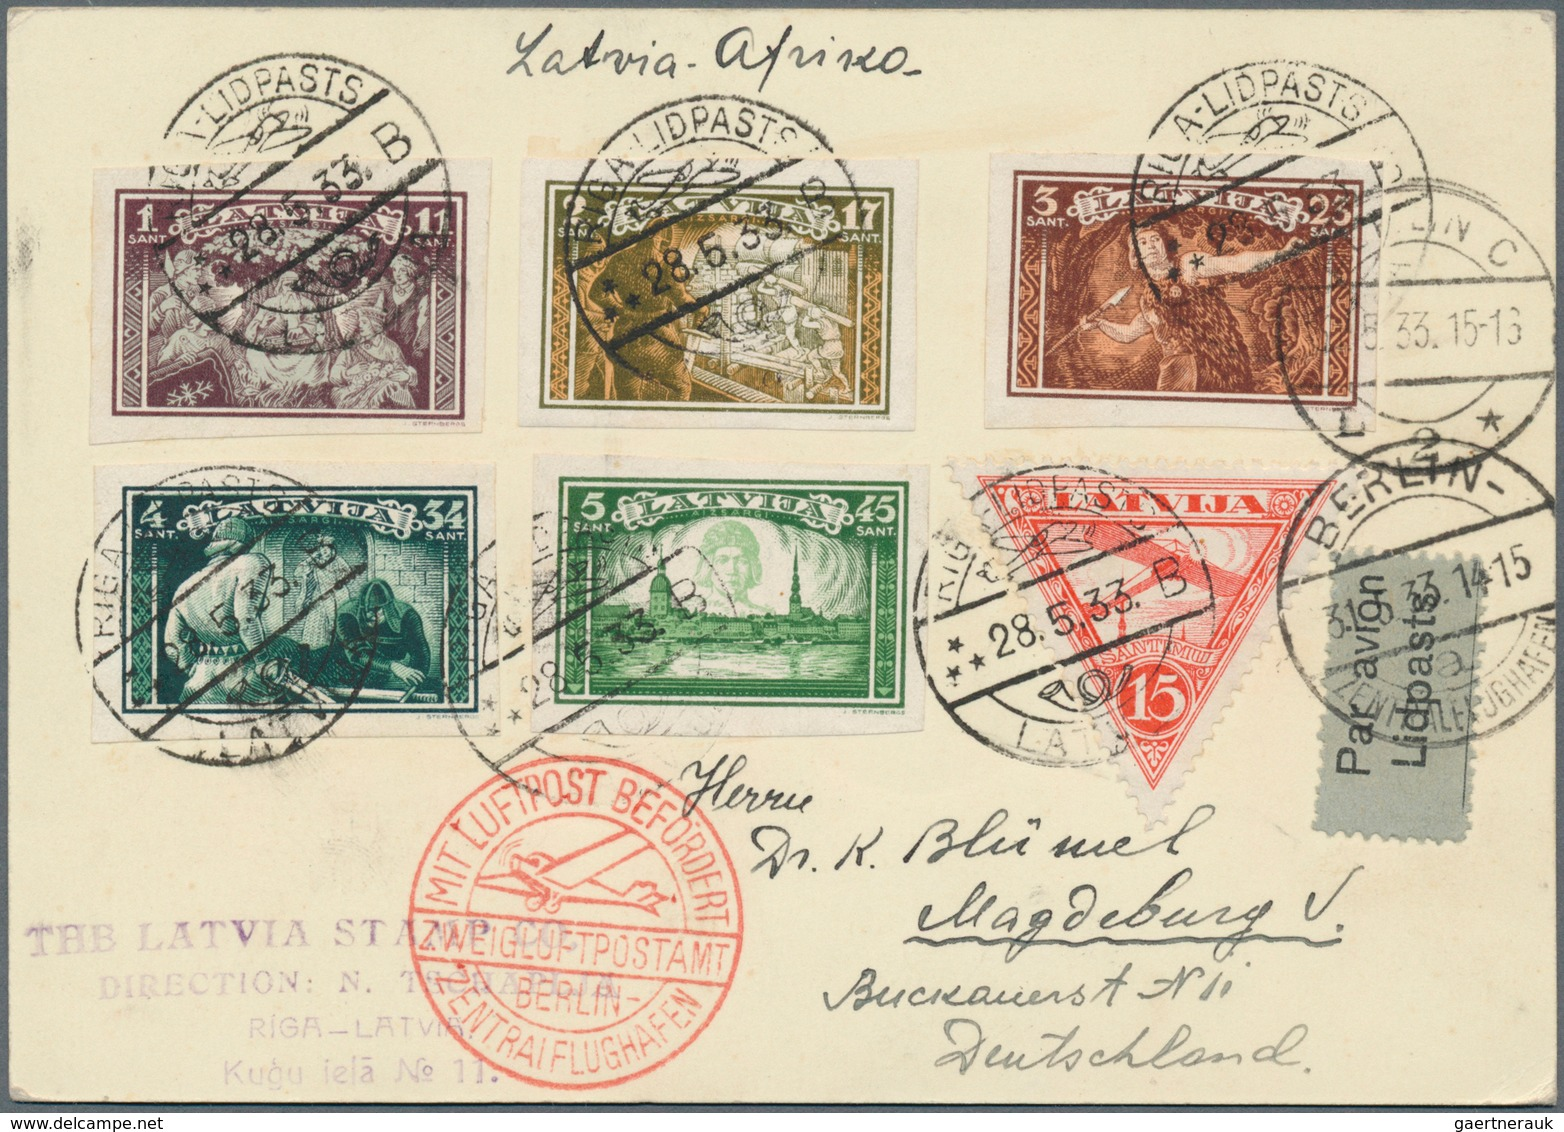 "Lettland: 1933, ""Africa Flight"" Leg To Berlin. Postcard With Better Franking From RIGA-LIDPASTB B 28 - Lettland"